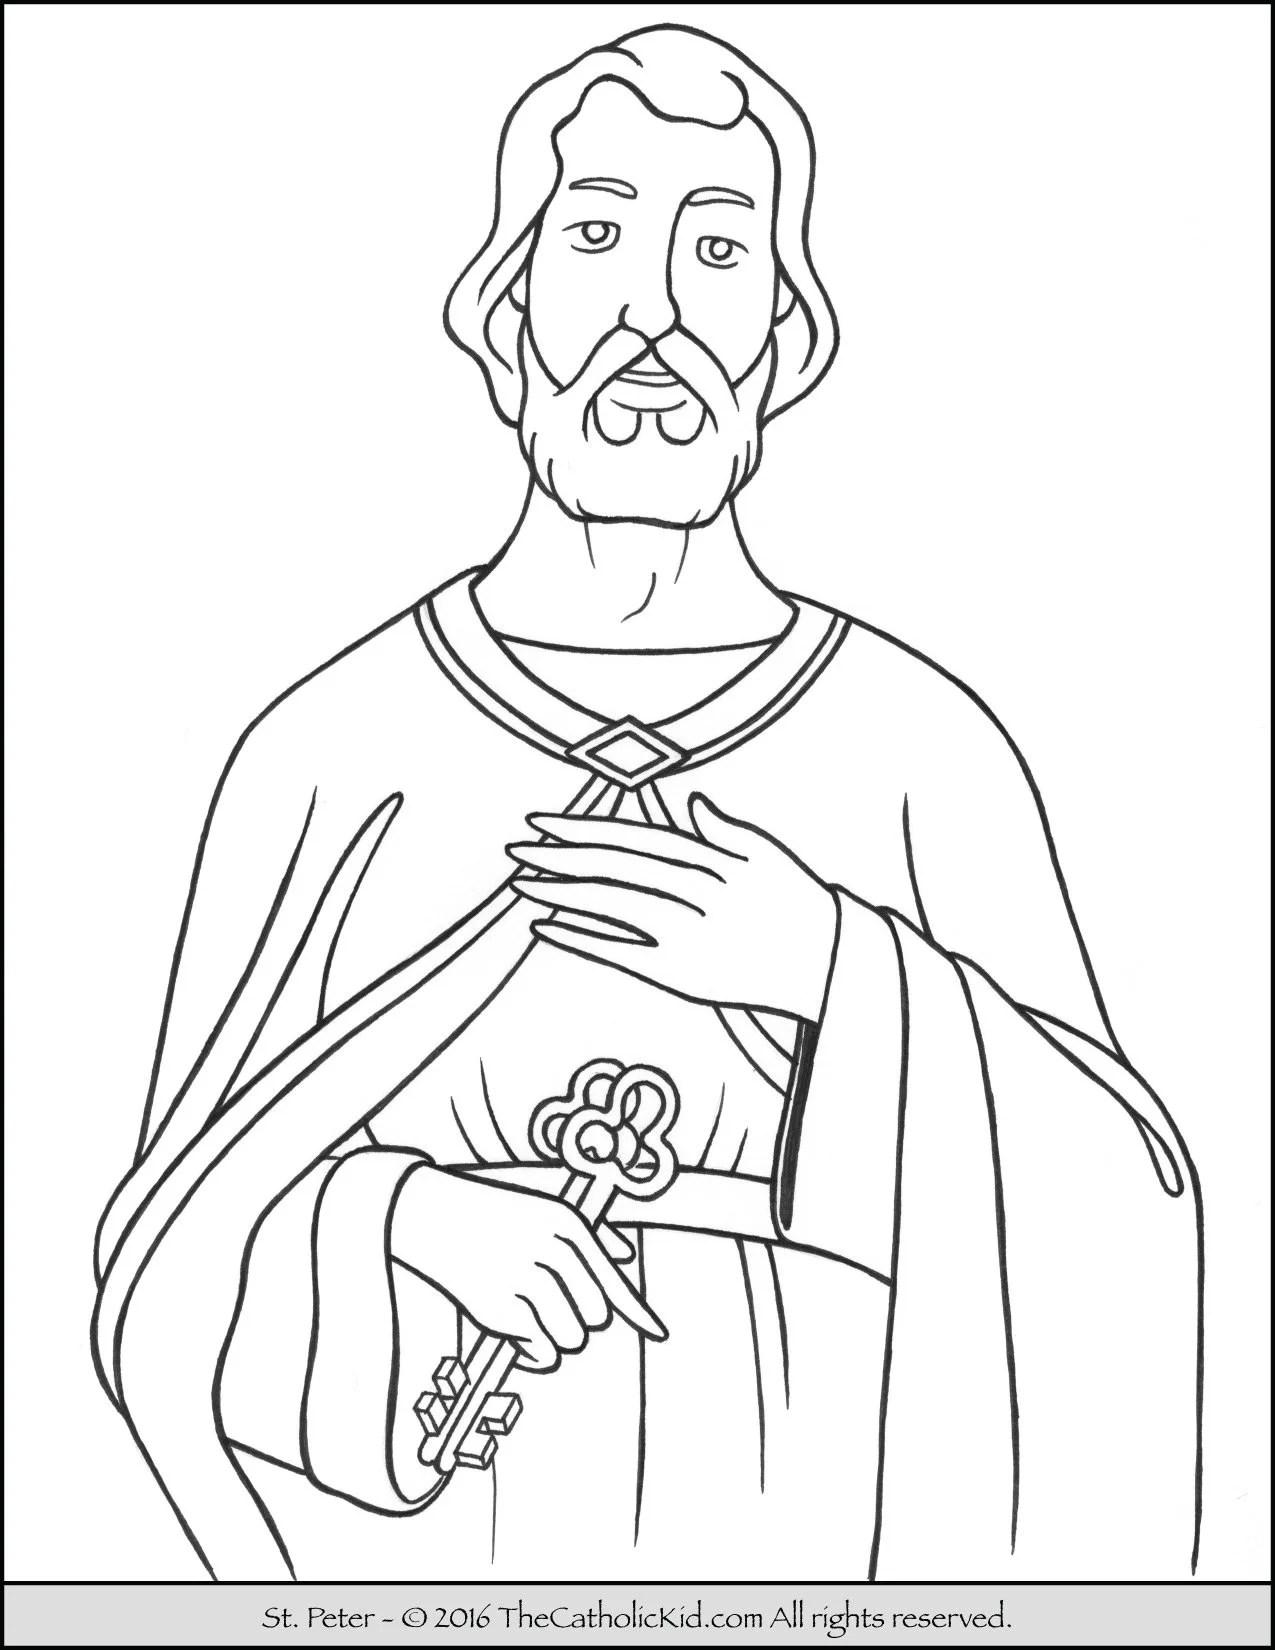 Saint Peter Coloring Page